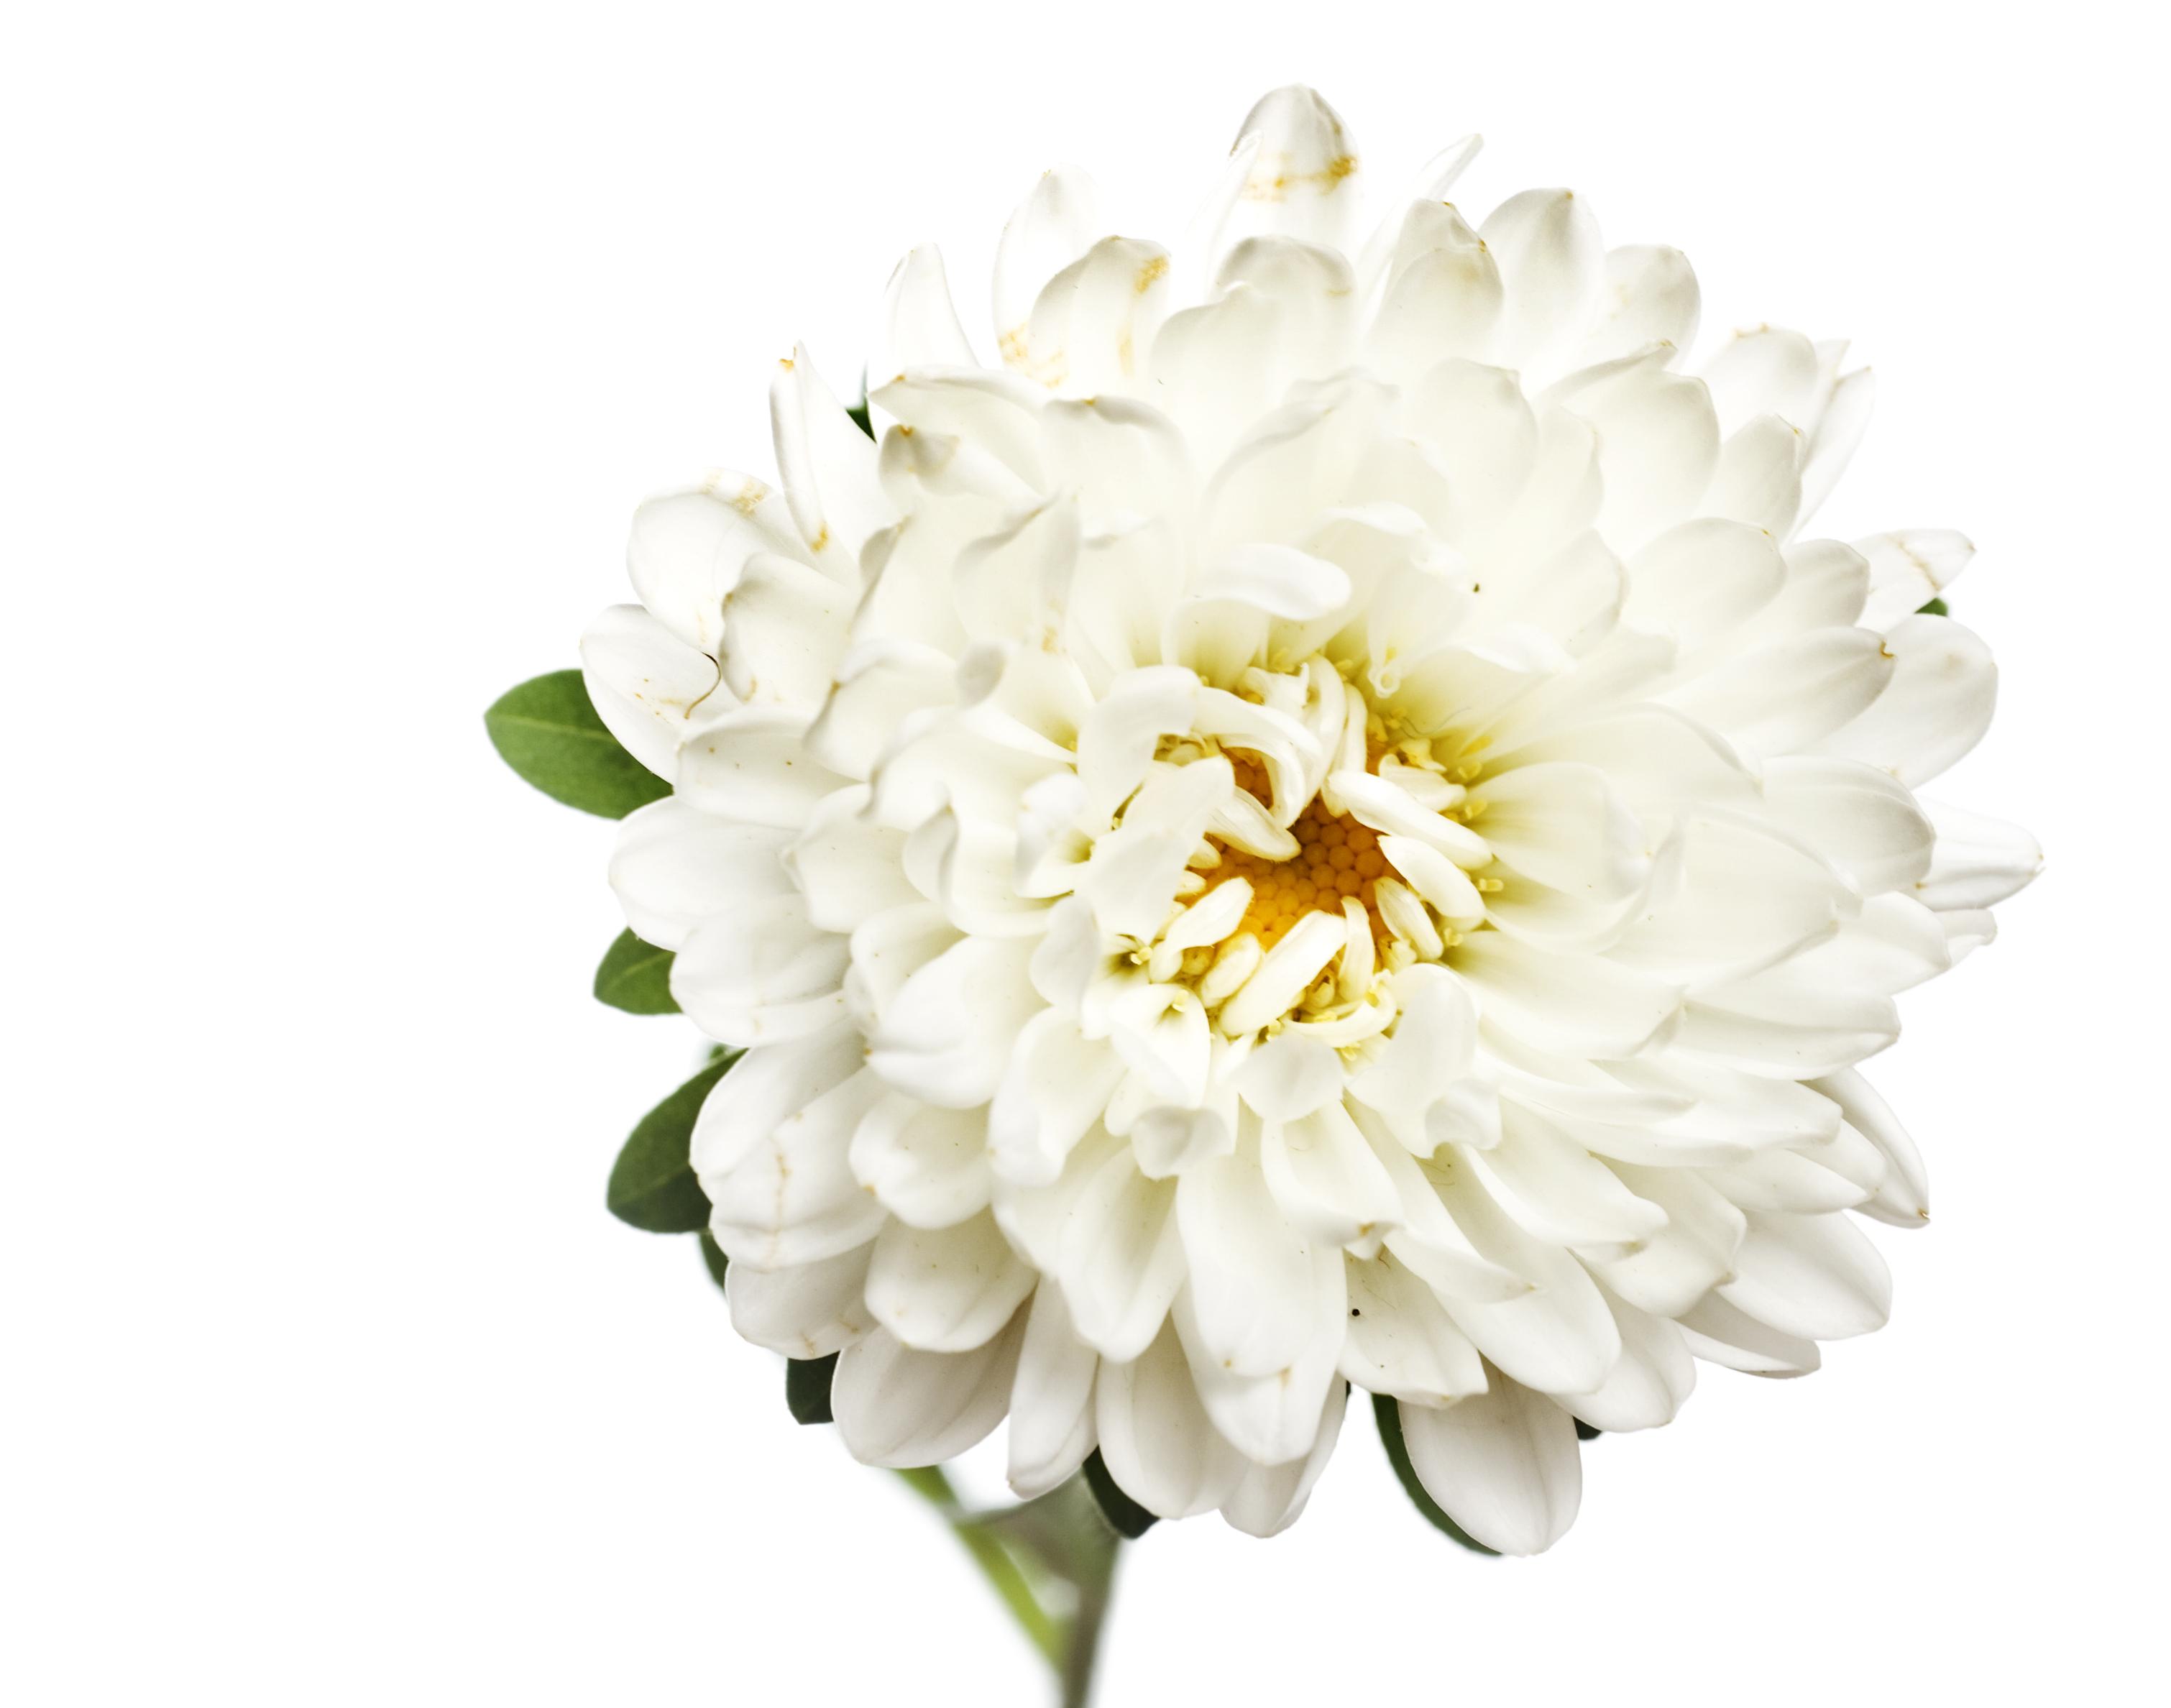 spring flower, Closeup, Detail, Flora, Floral, HQ Photo